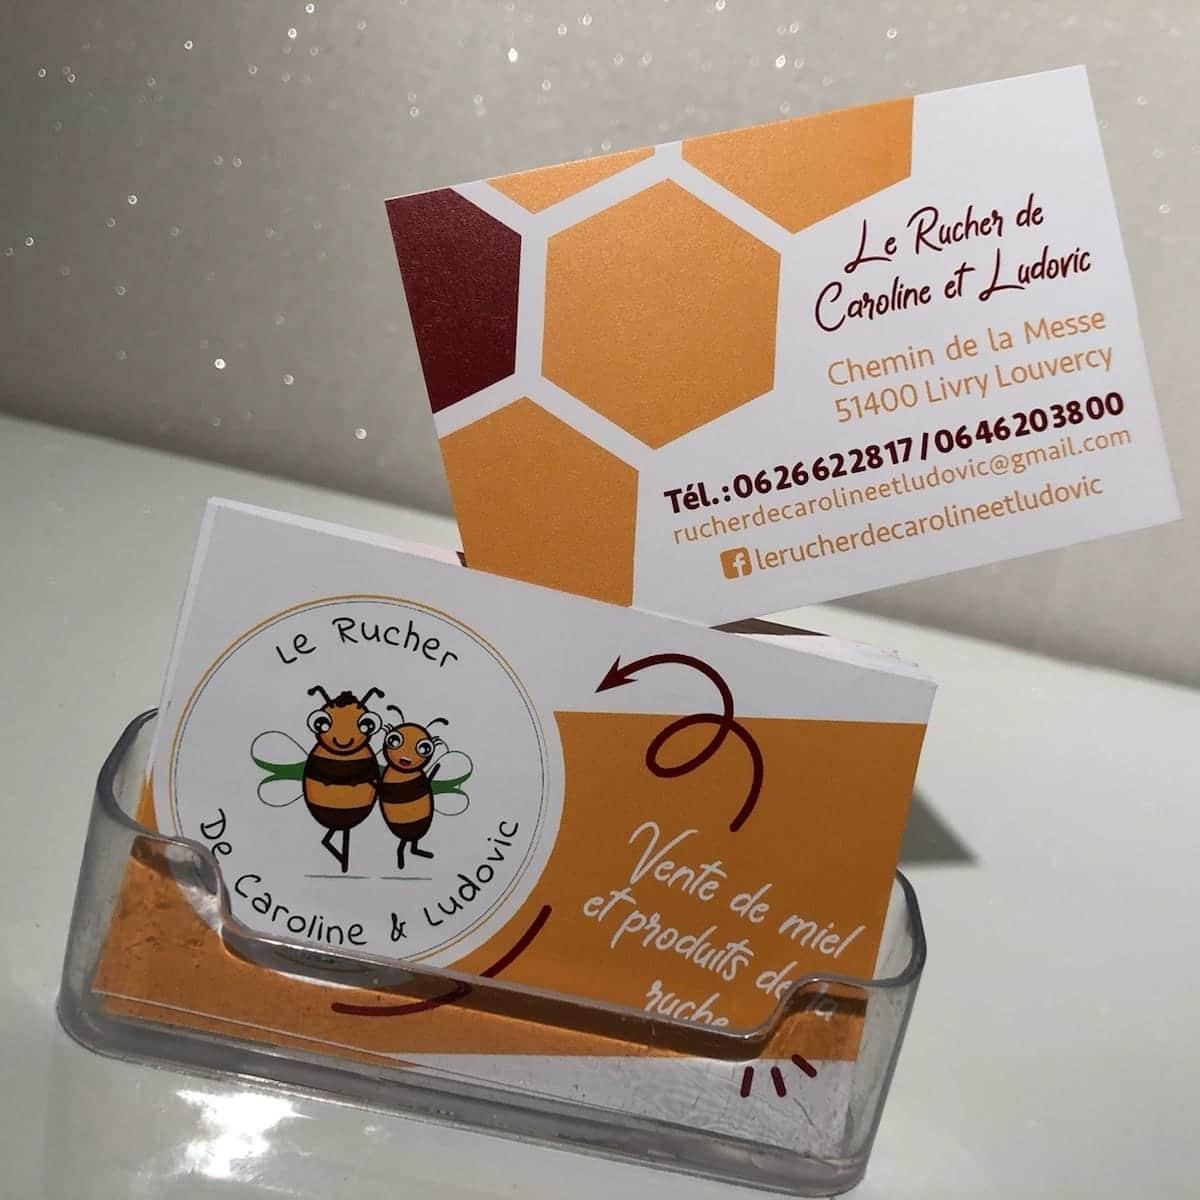 honey and bees logotype le rucher de caroline et ludovic